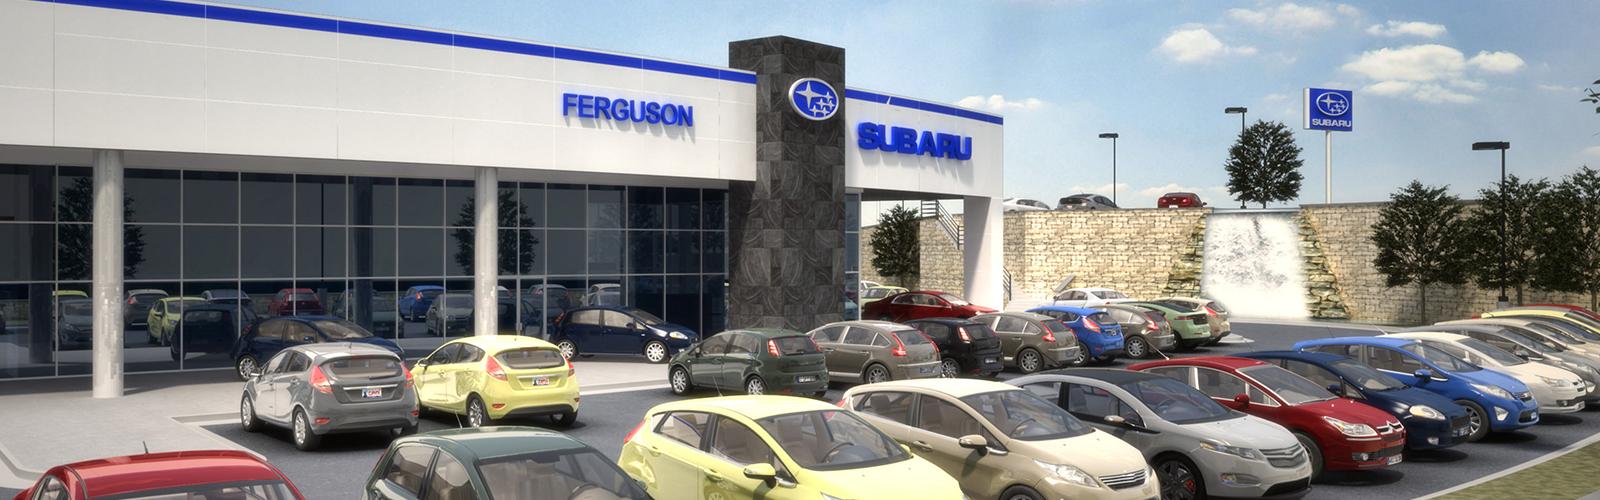 Ferguson-Subaru-Banner-1